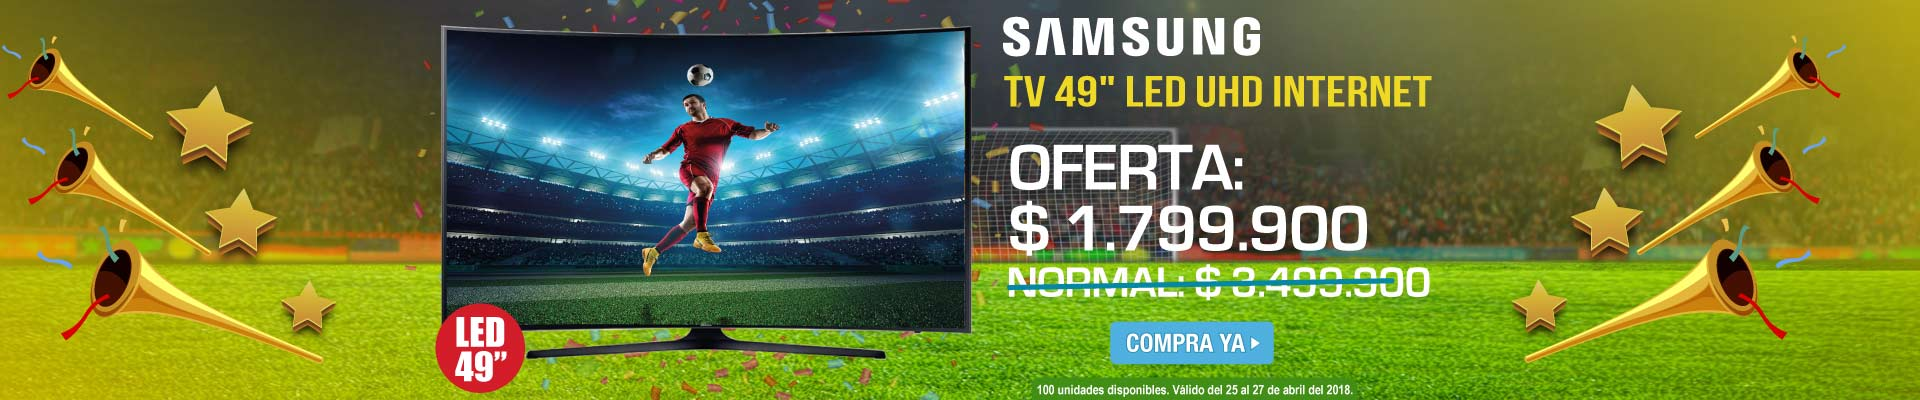 CAT ALKP-1-TV-TV 49 124cm SAMSUNG LED 49MU6300 UHD Internet-prod-Abril25-27